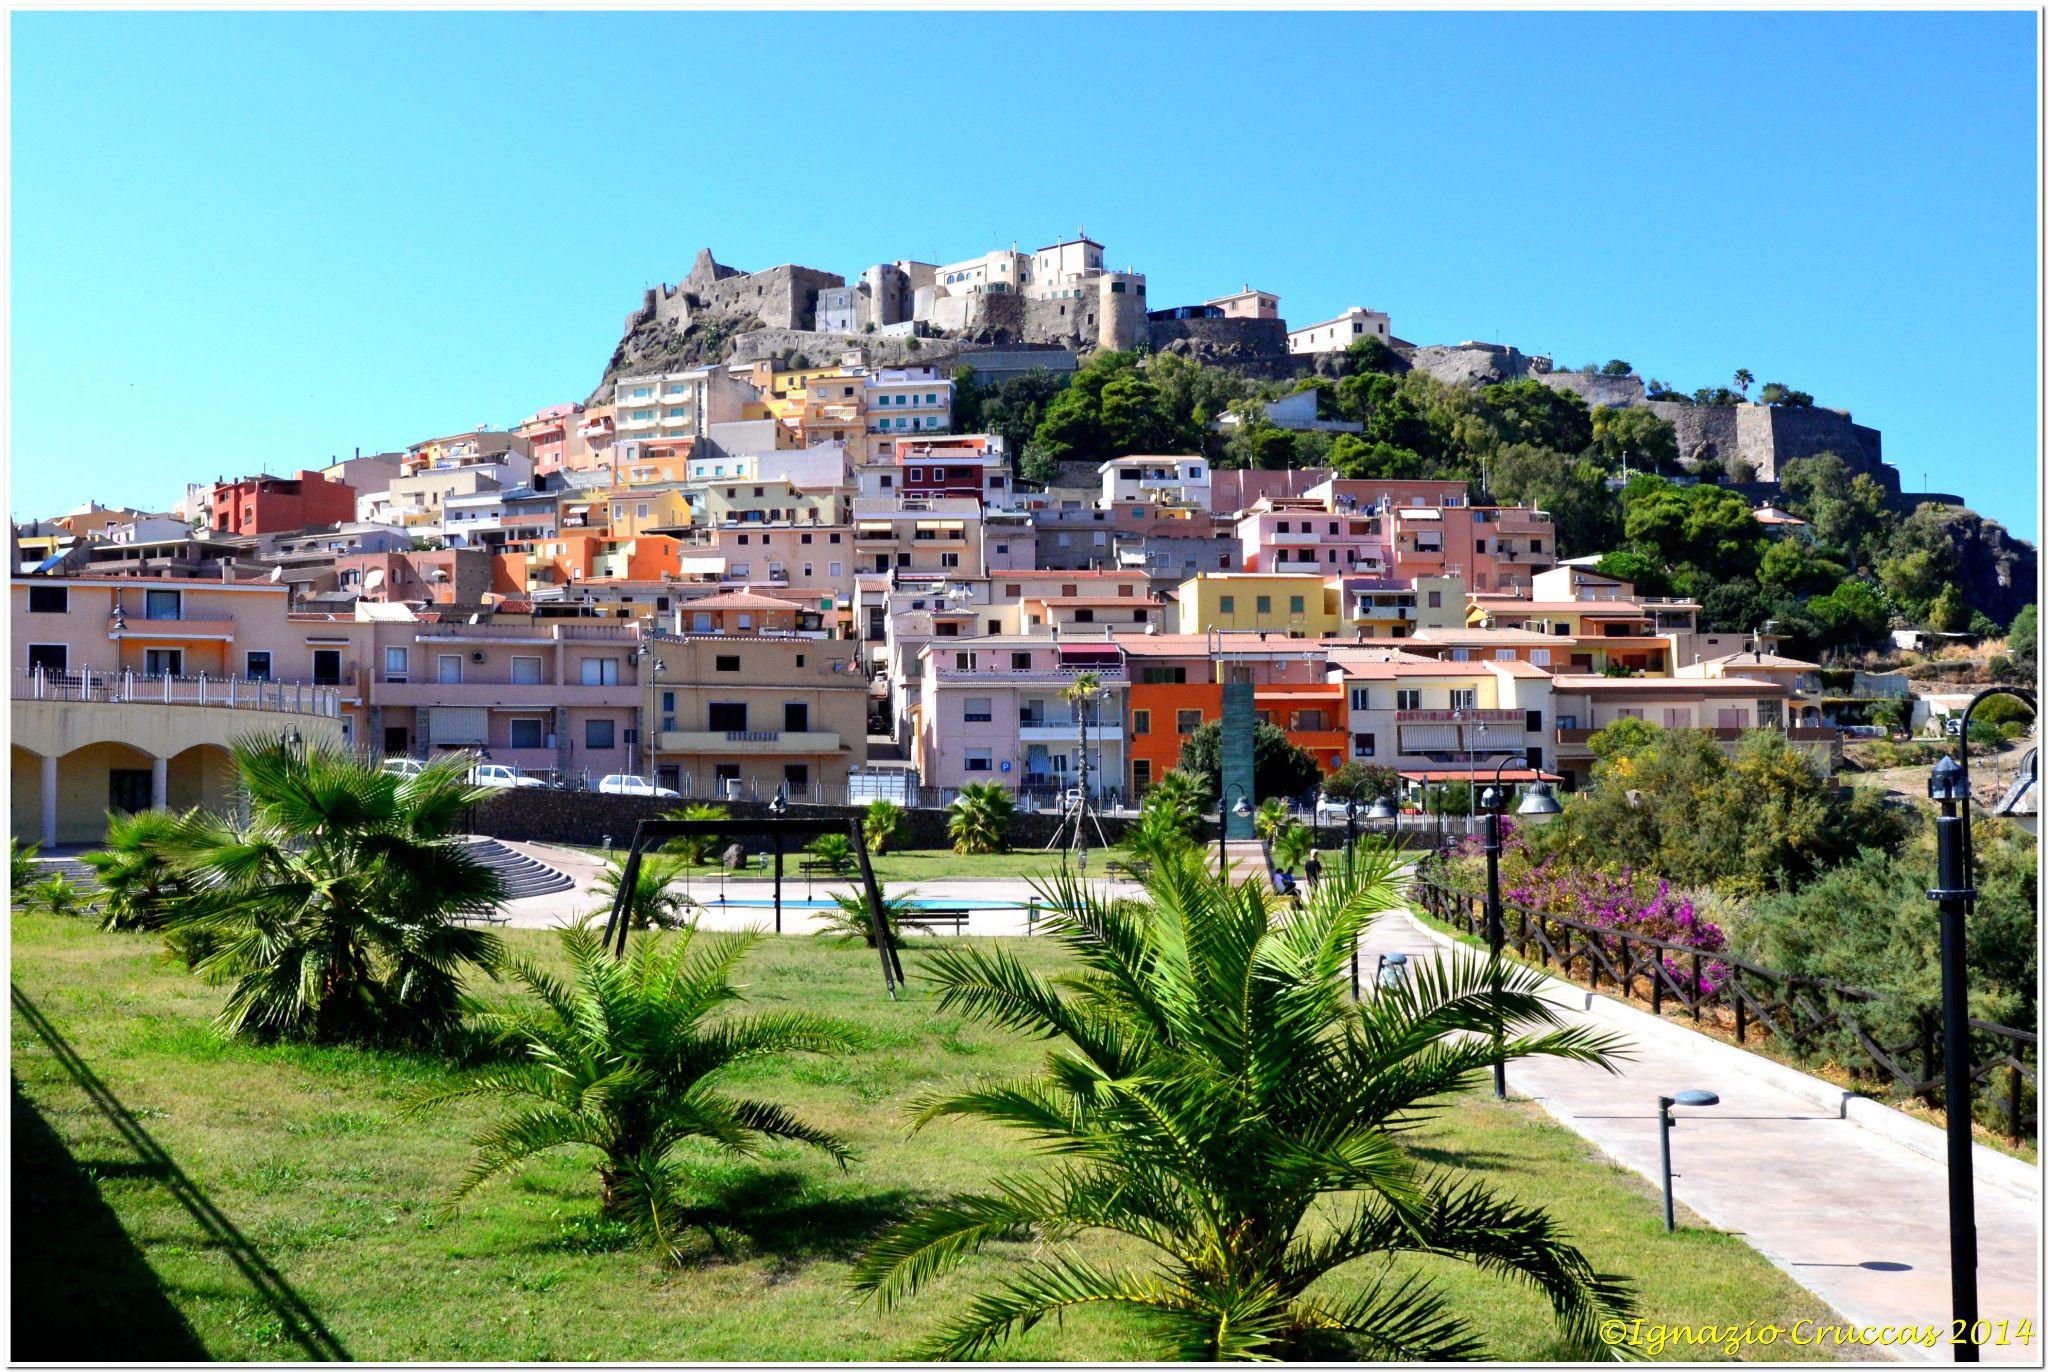 Castelsardo Sardinia Italy by ignazio cruccas